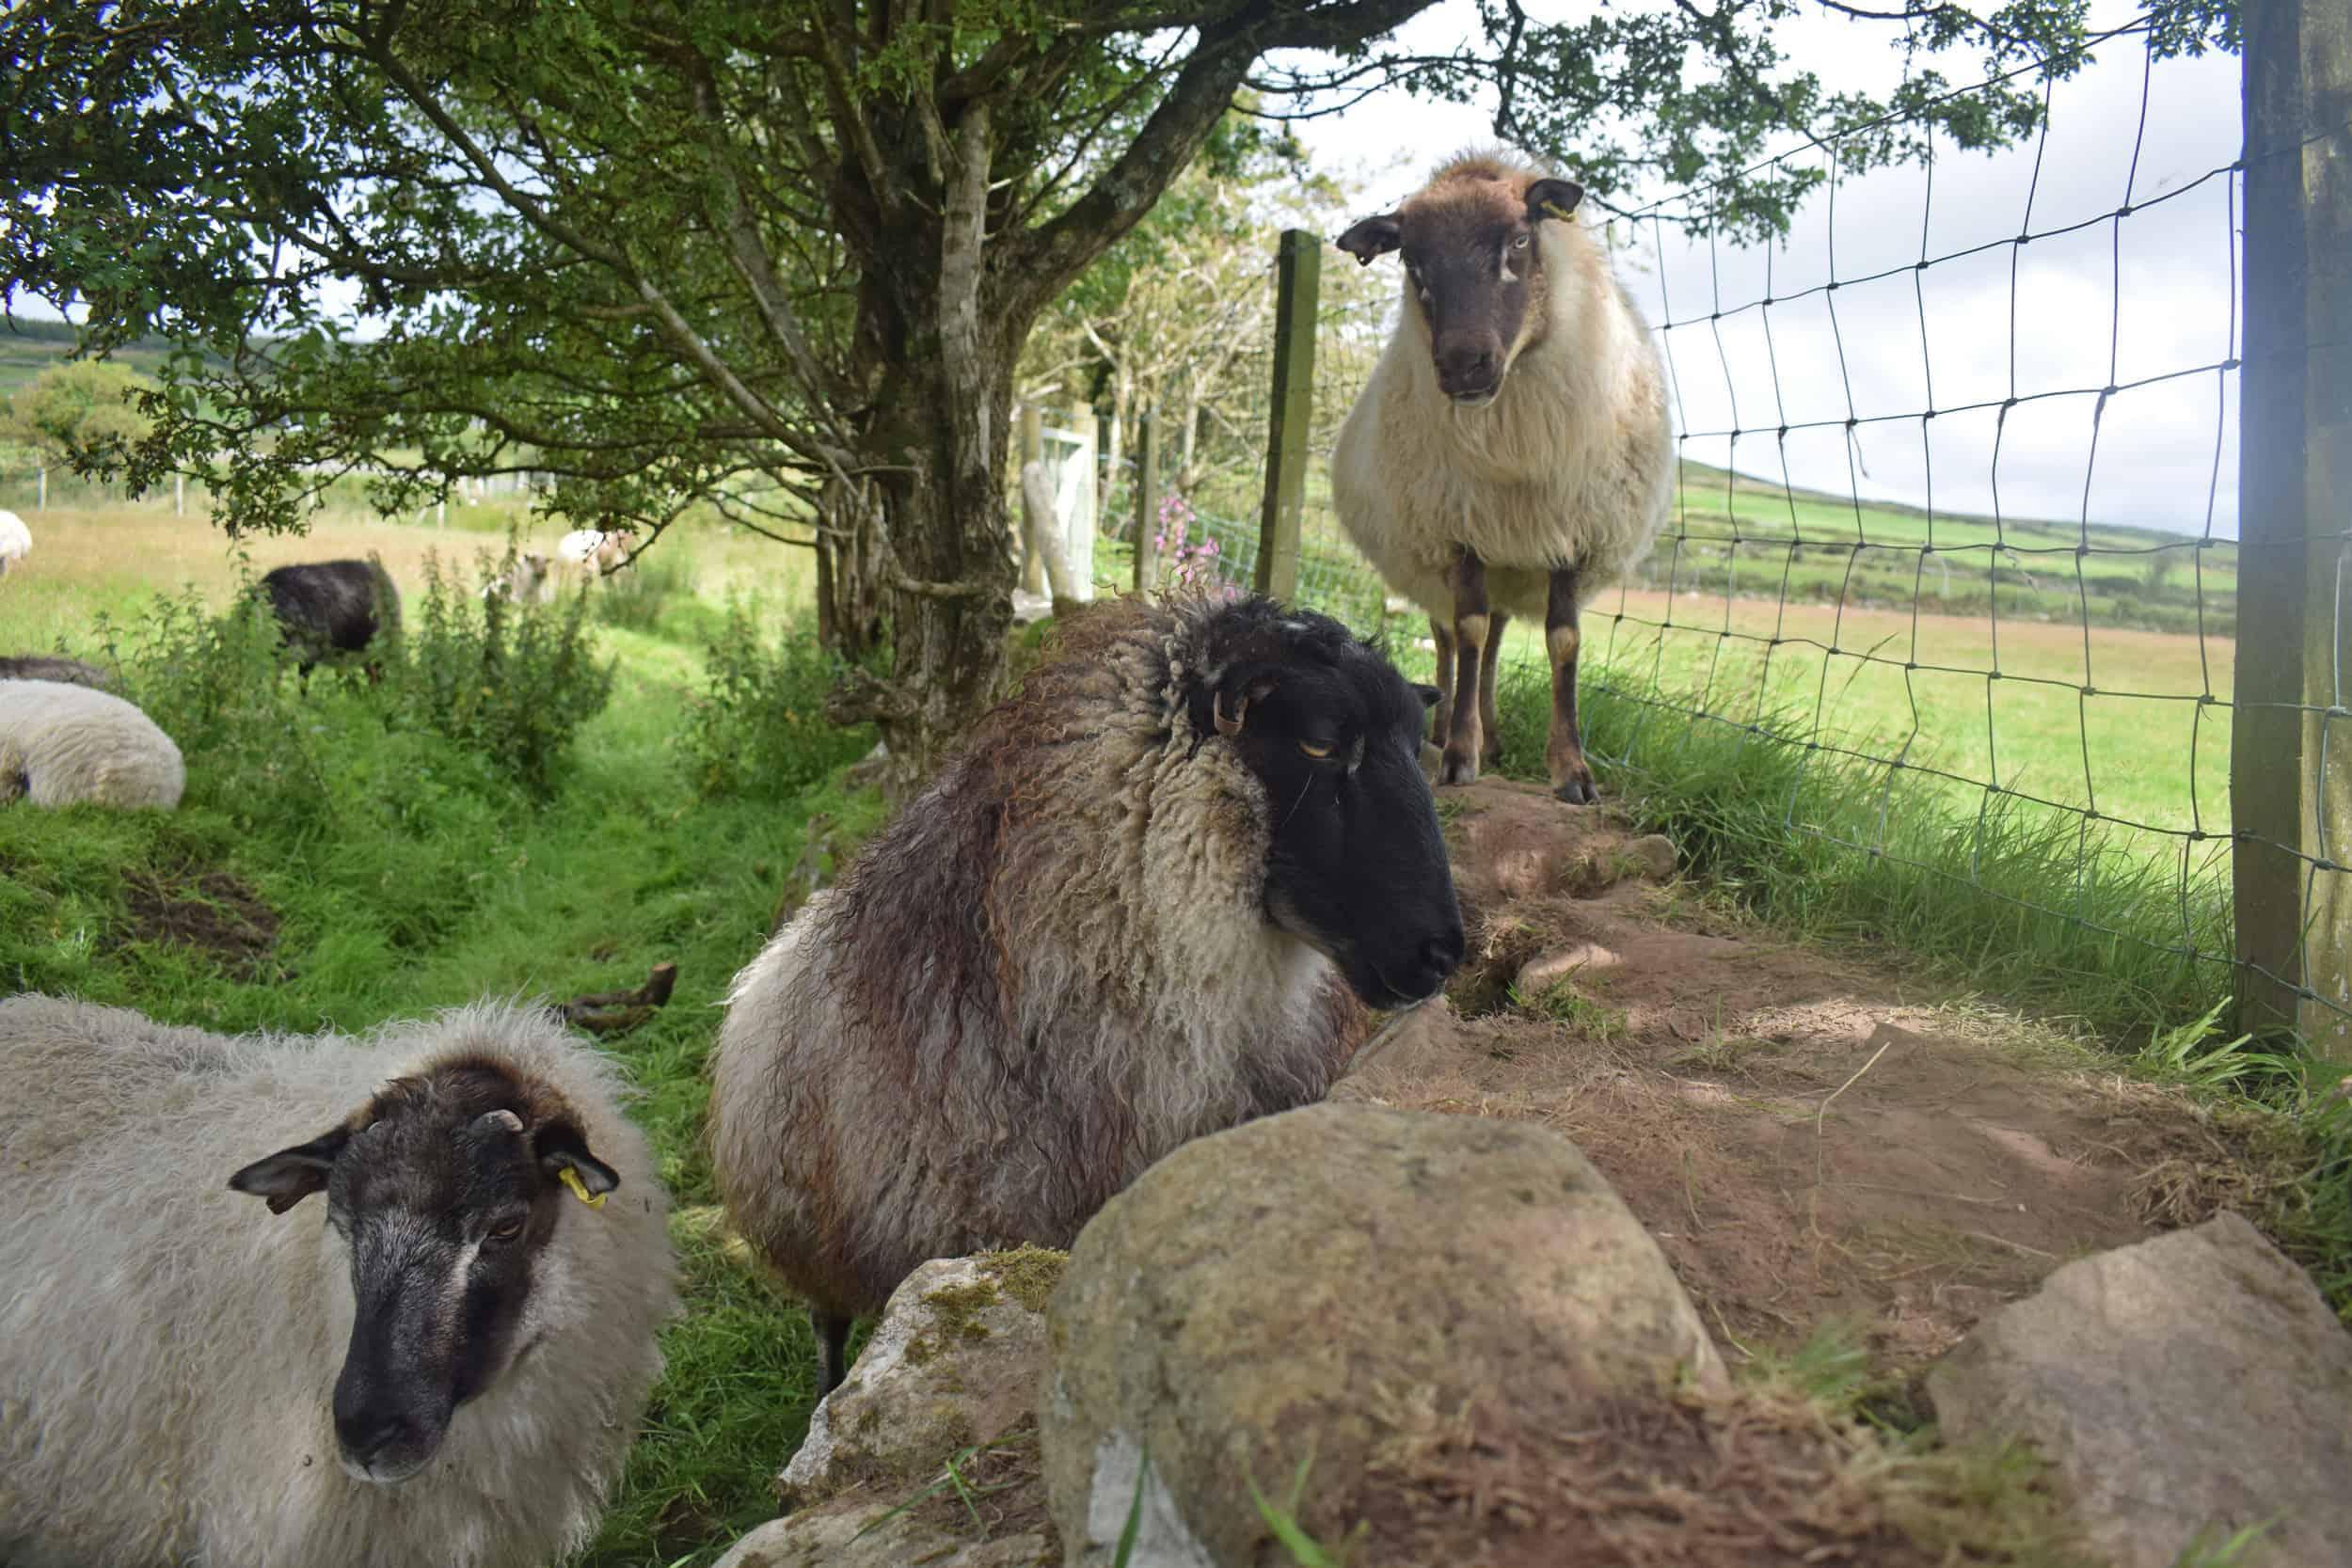 Ivar gotland cross icelandic grey mouflon patchwork sheep wool felted fleece rug ethical kind 5